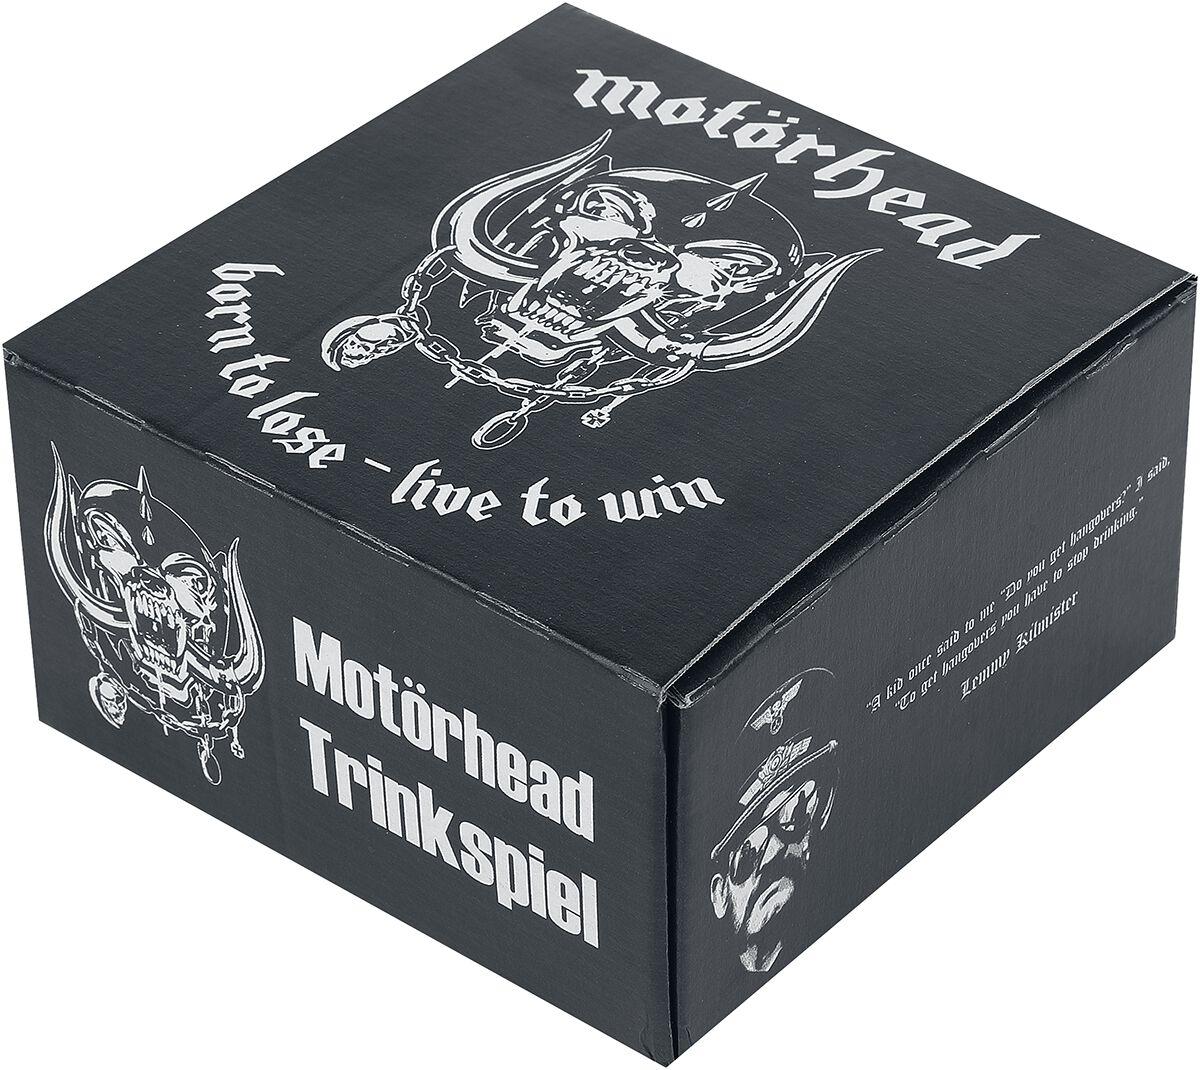 Motörhead Born To Lose - Live To Win: Trinkspiel  Brettspiel  Standard